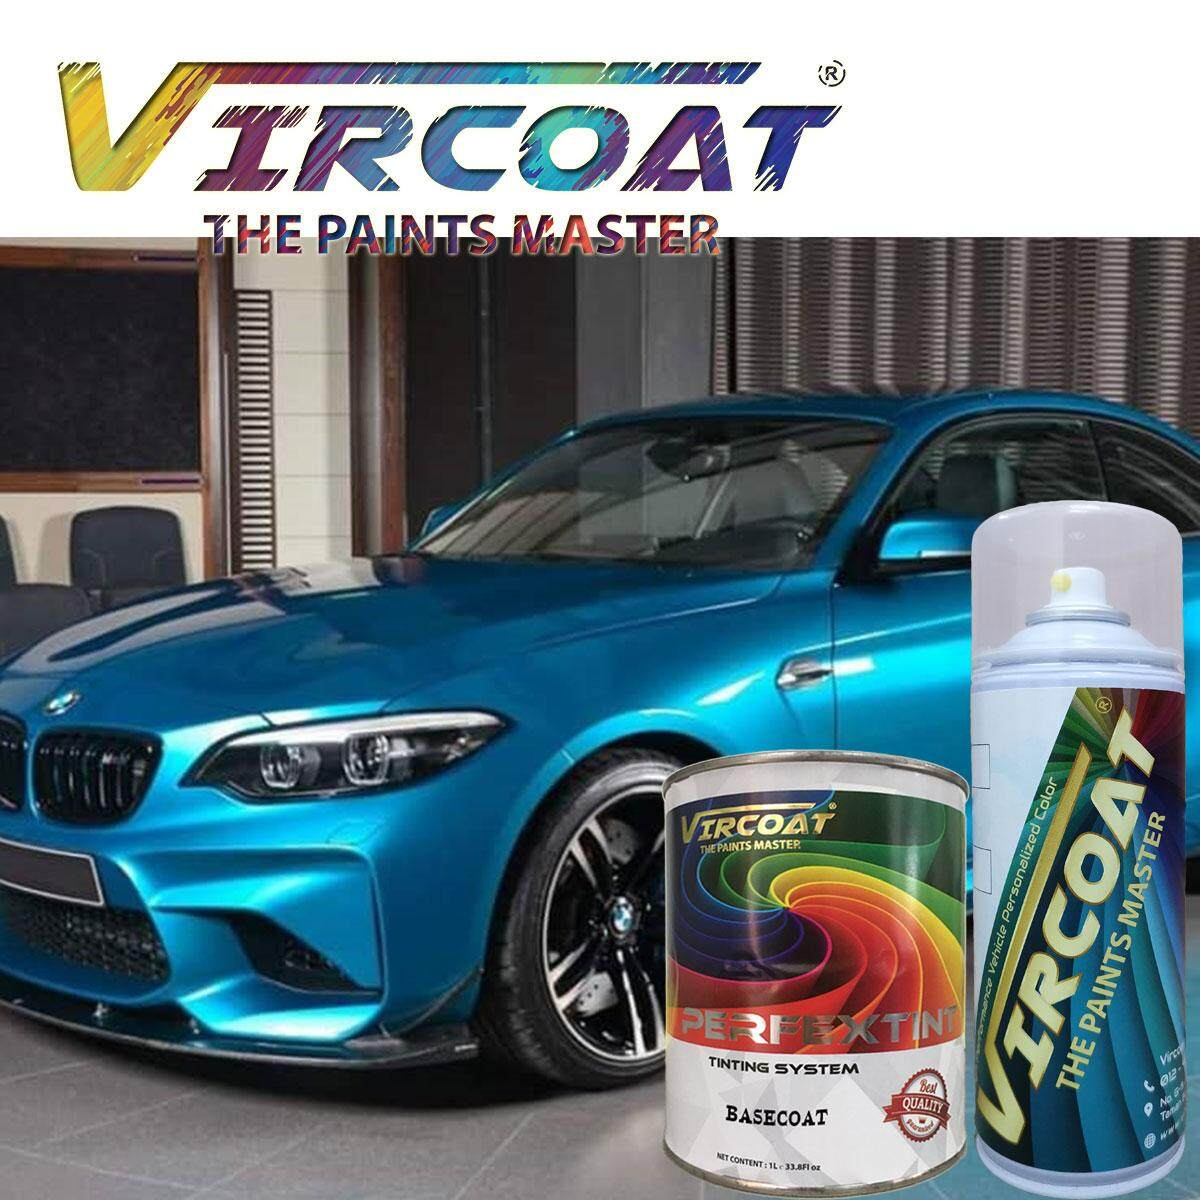 VIRCOAT Paints & Primers price in Malaysia - Best VIRCOAT